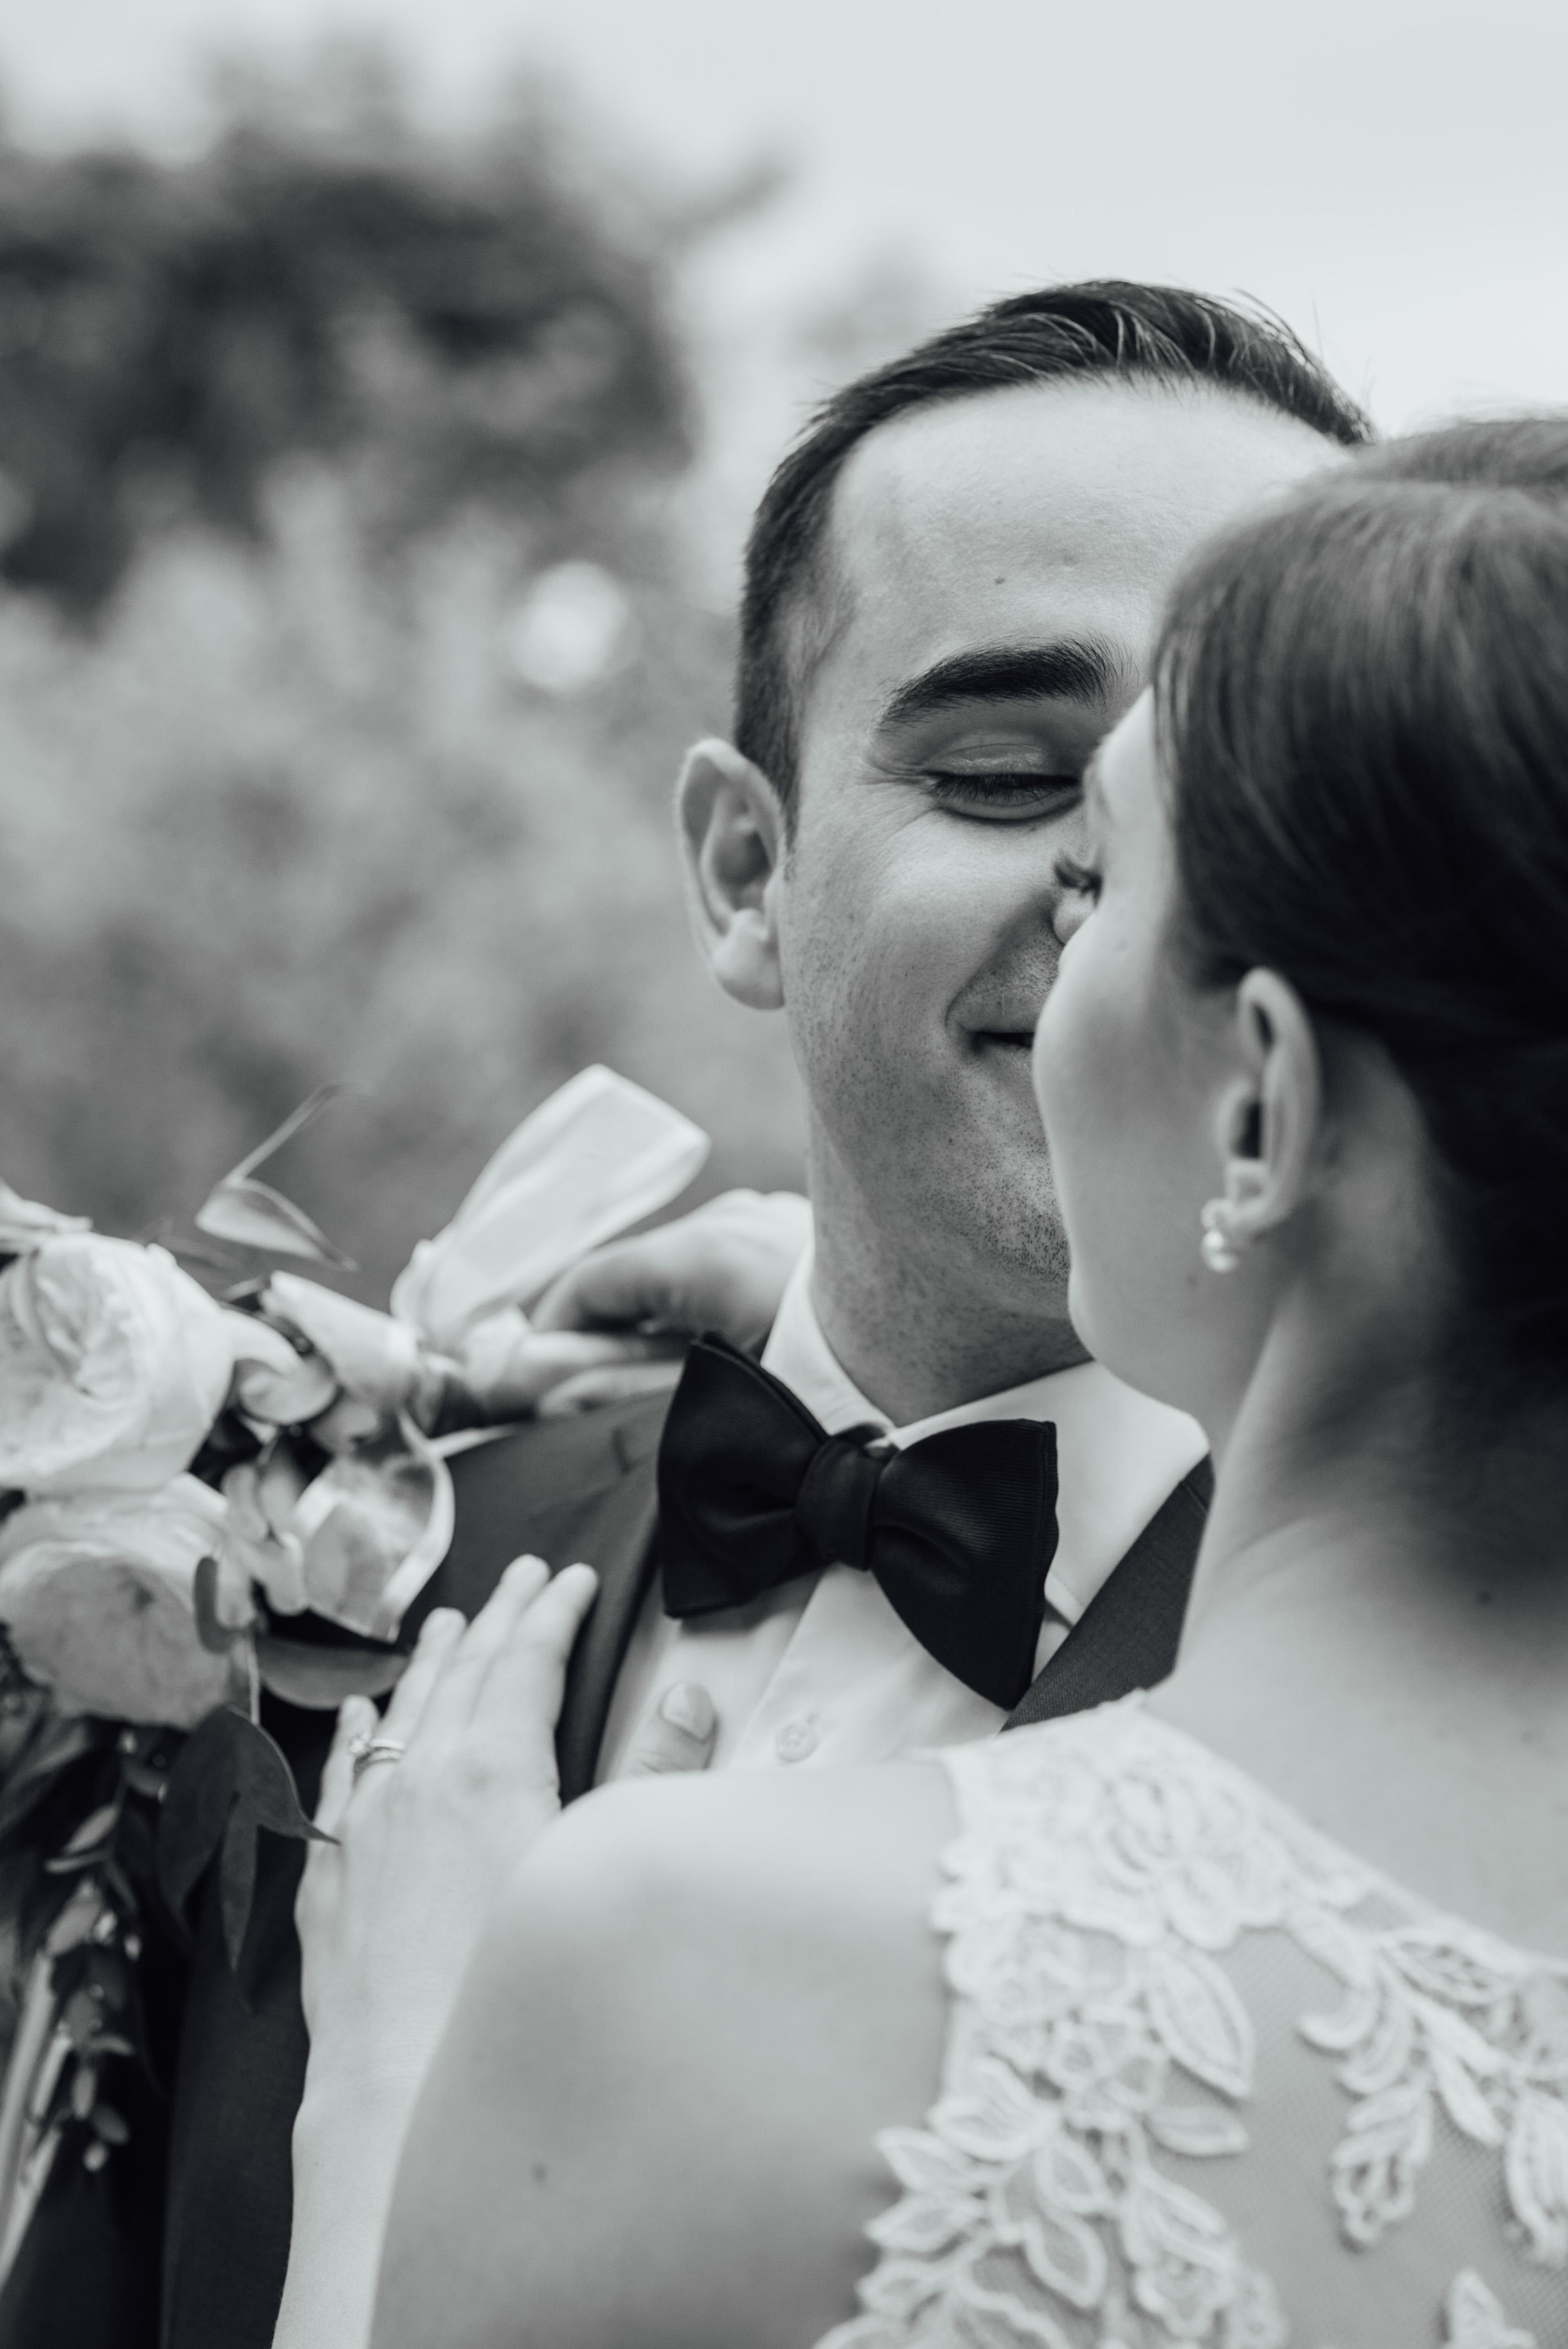 cleland-studios-wedding-photography-45.jpg